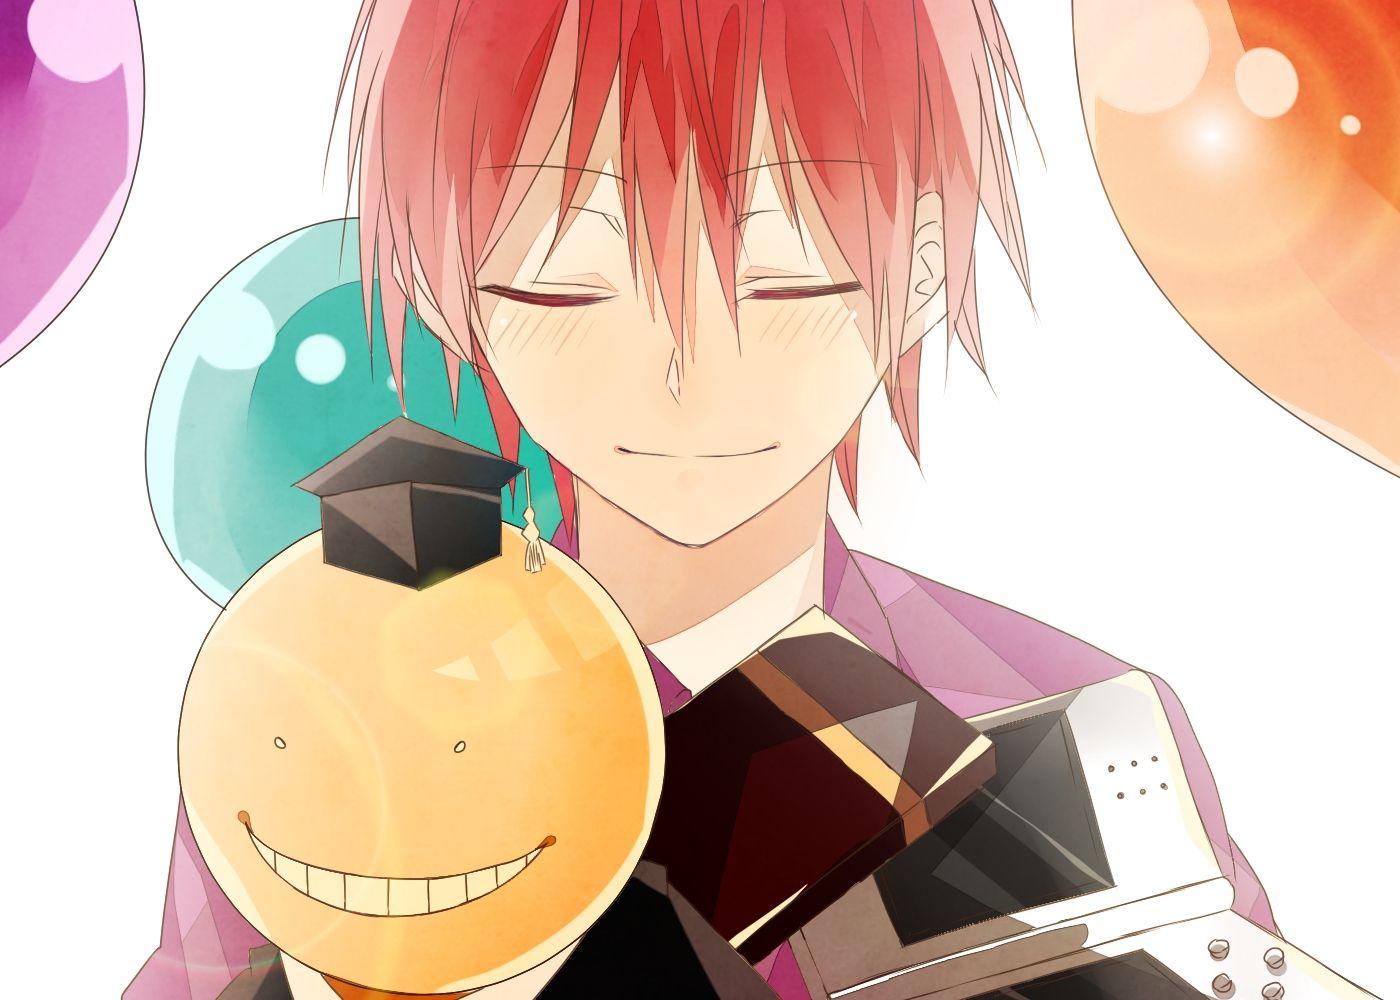 Pin By Ni On Ansatsu Kyoushitsu Karma Akabane Anime Karma Akabane Assassination Classroom